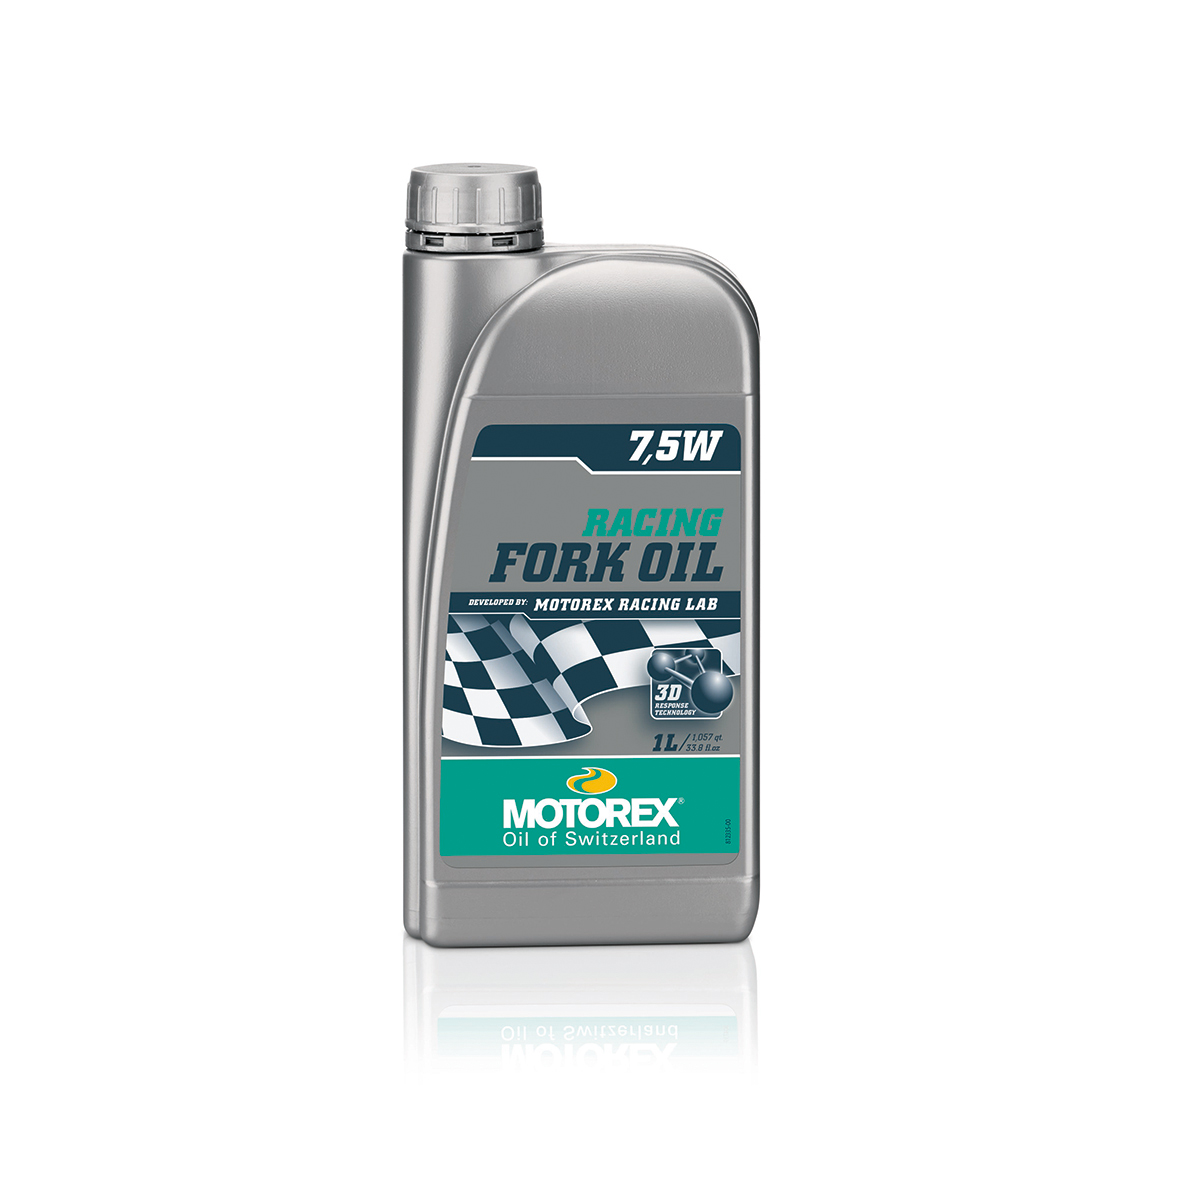 20200827_RACING_FORK_OIL_7_5W_1L